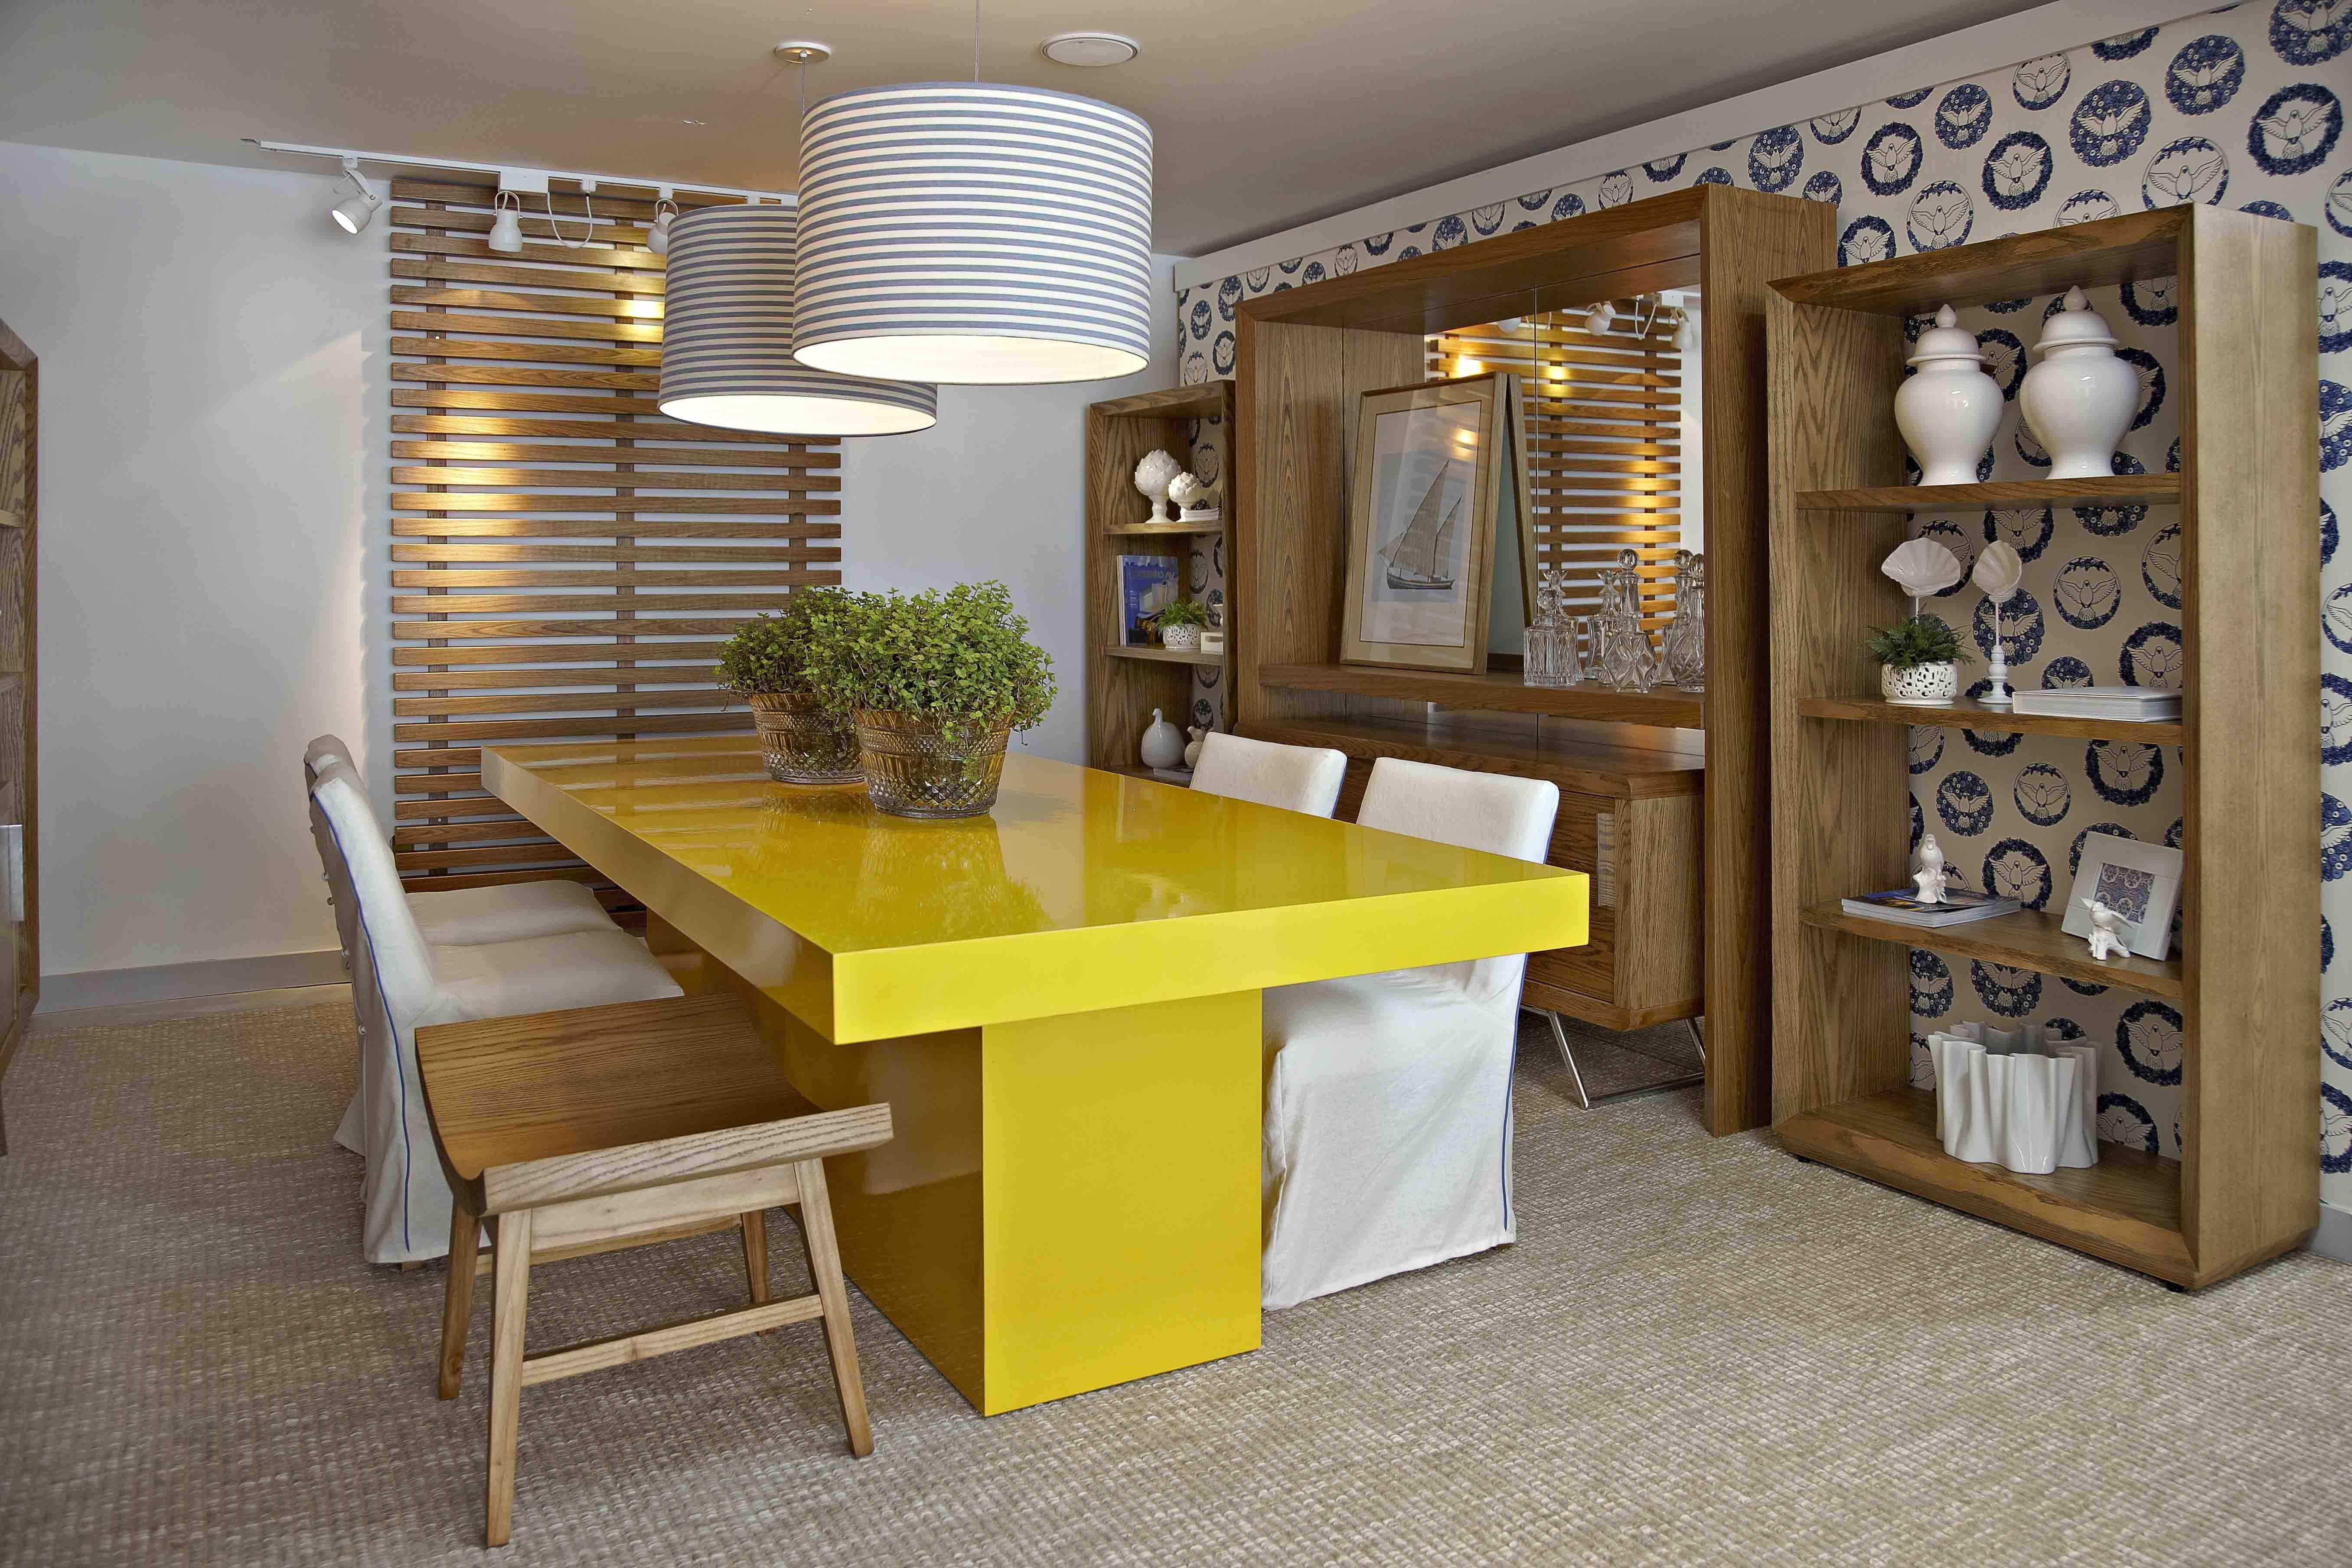 Decora O Sala Azul Turquesa E Amarelo Pesquisa Google De Cor  -> Decoracao Sala De Jantar Azul